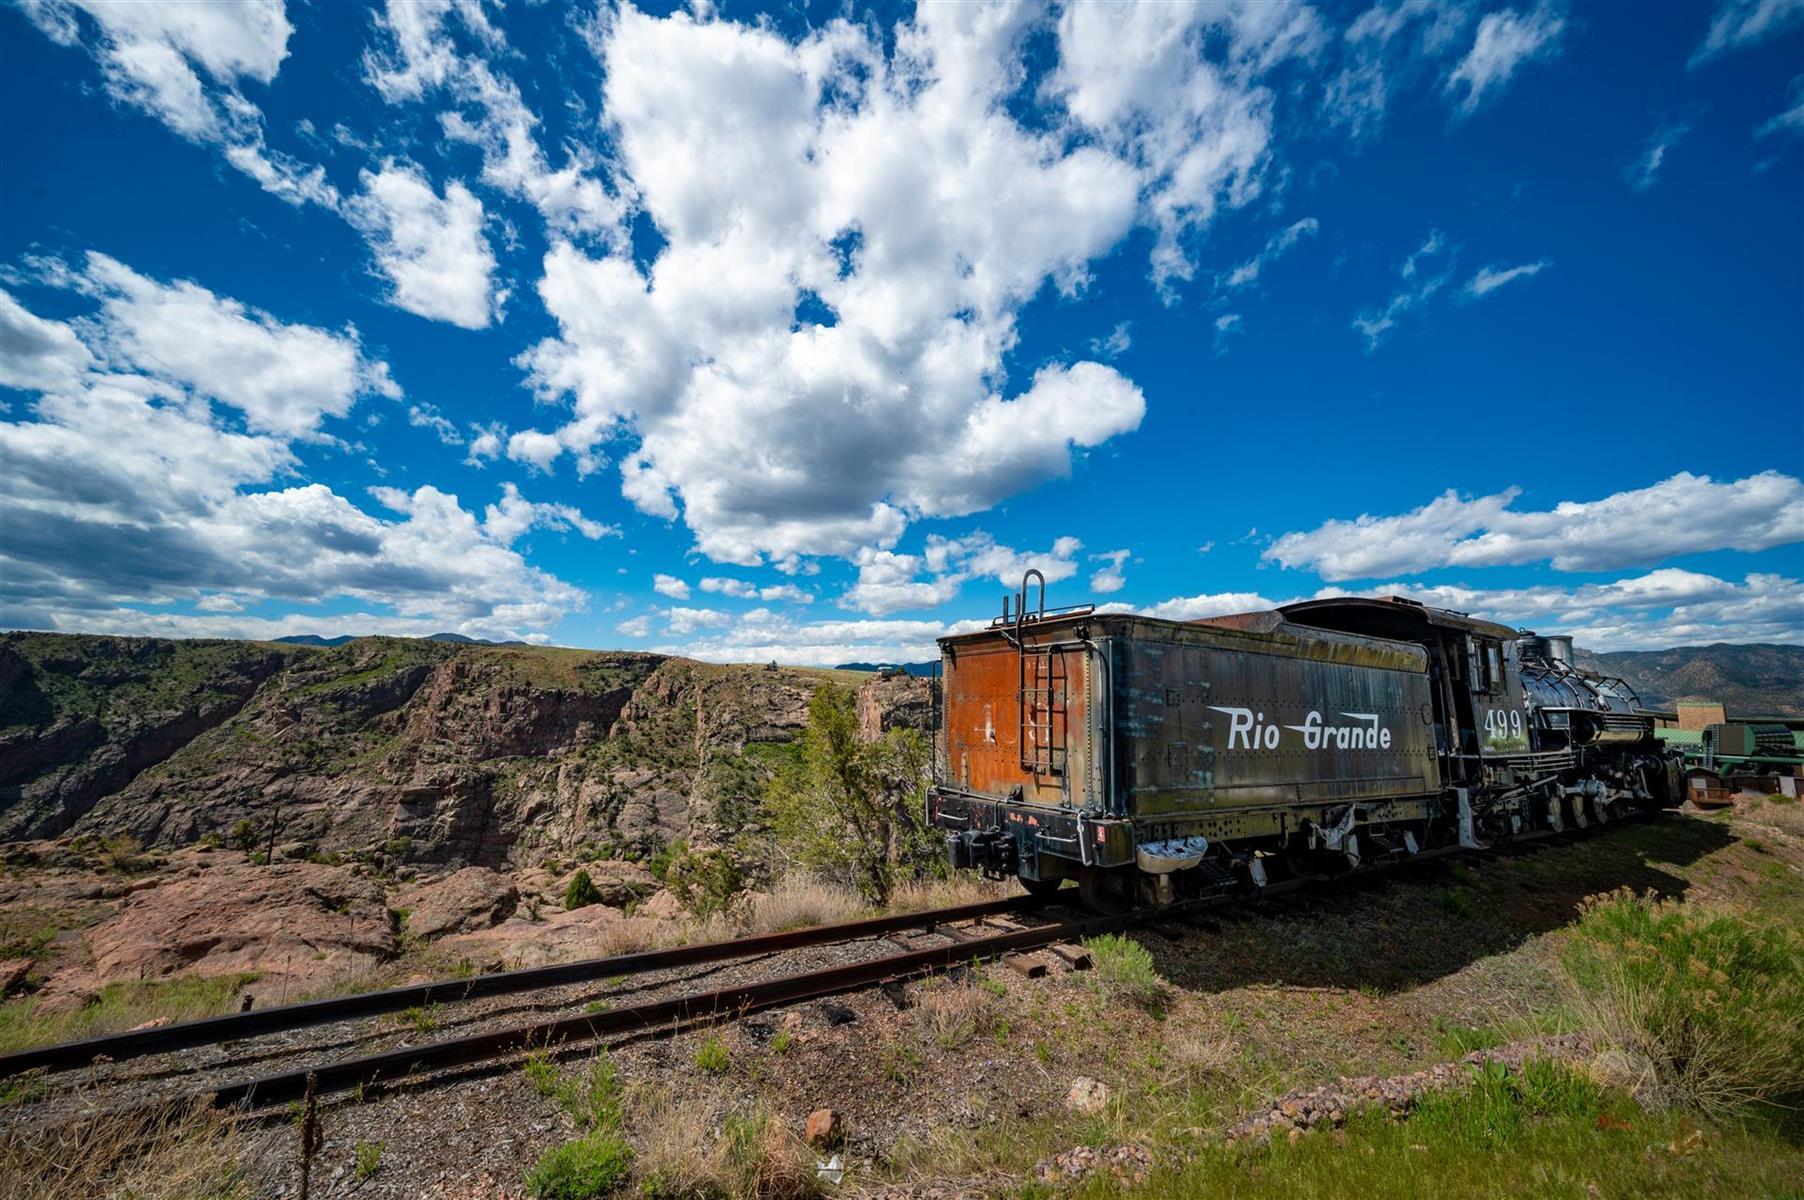 Royal Gorge Train Caboose 0584